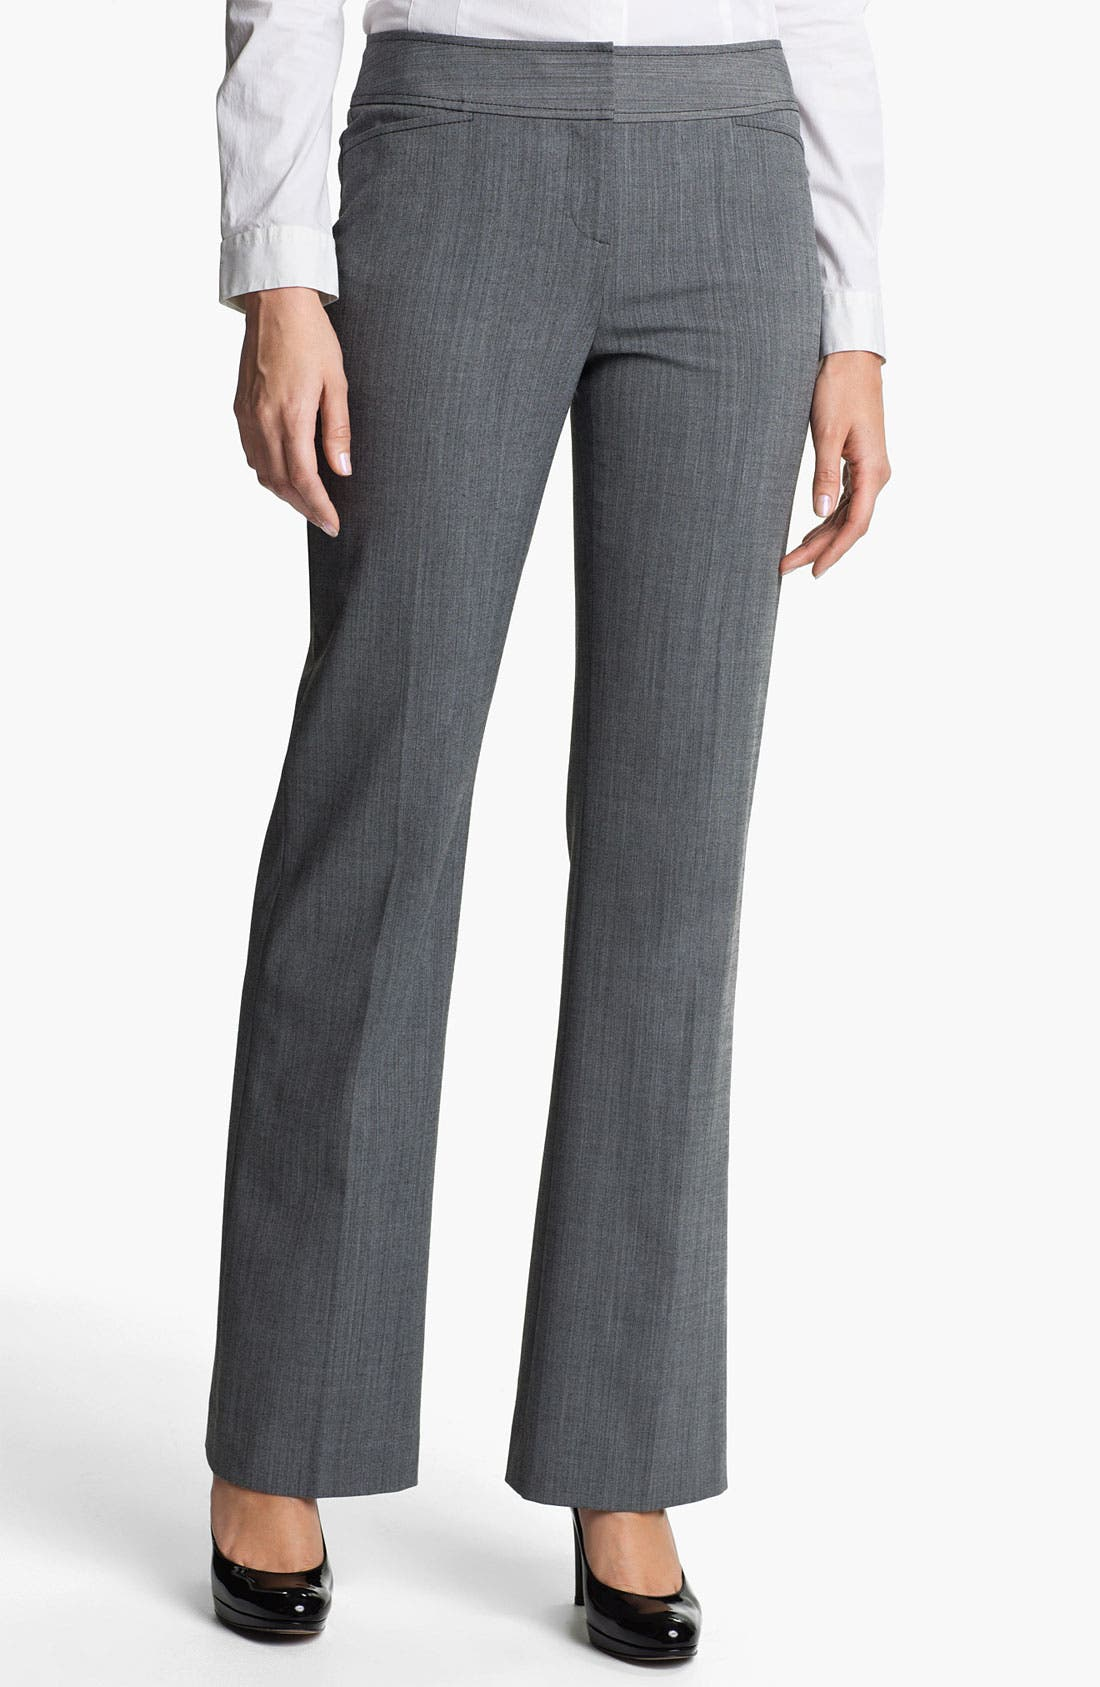 Alternate Image 1 Selected - Halogen® 'Taylor' Cross Dye Curvy Fit Pants